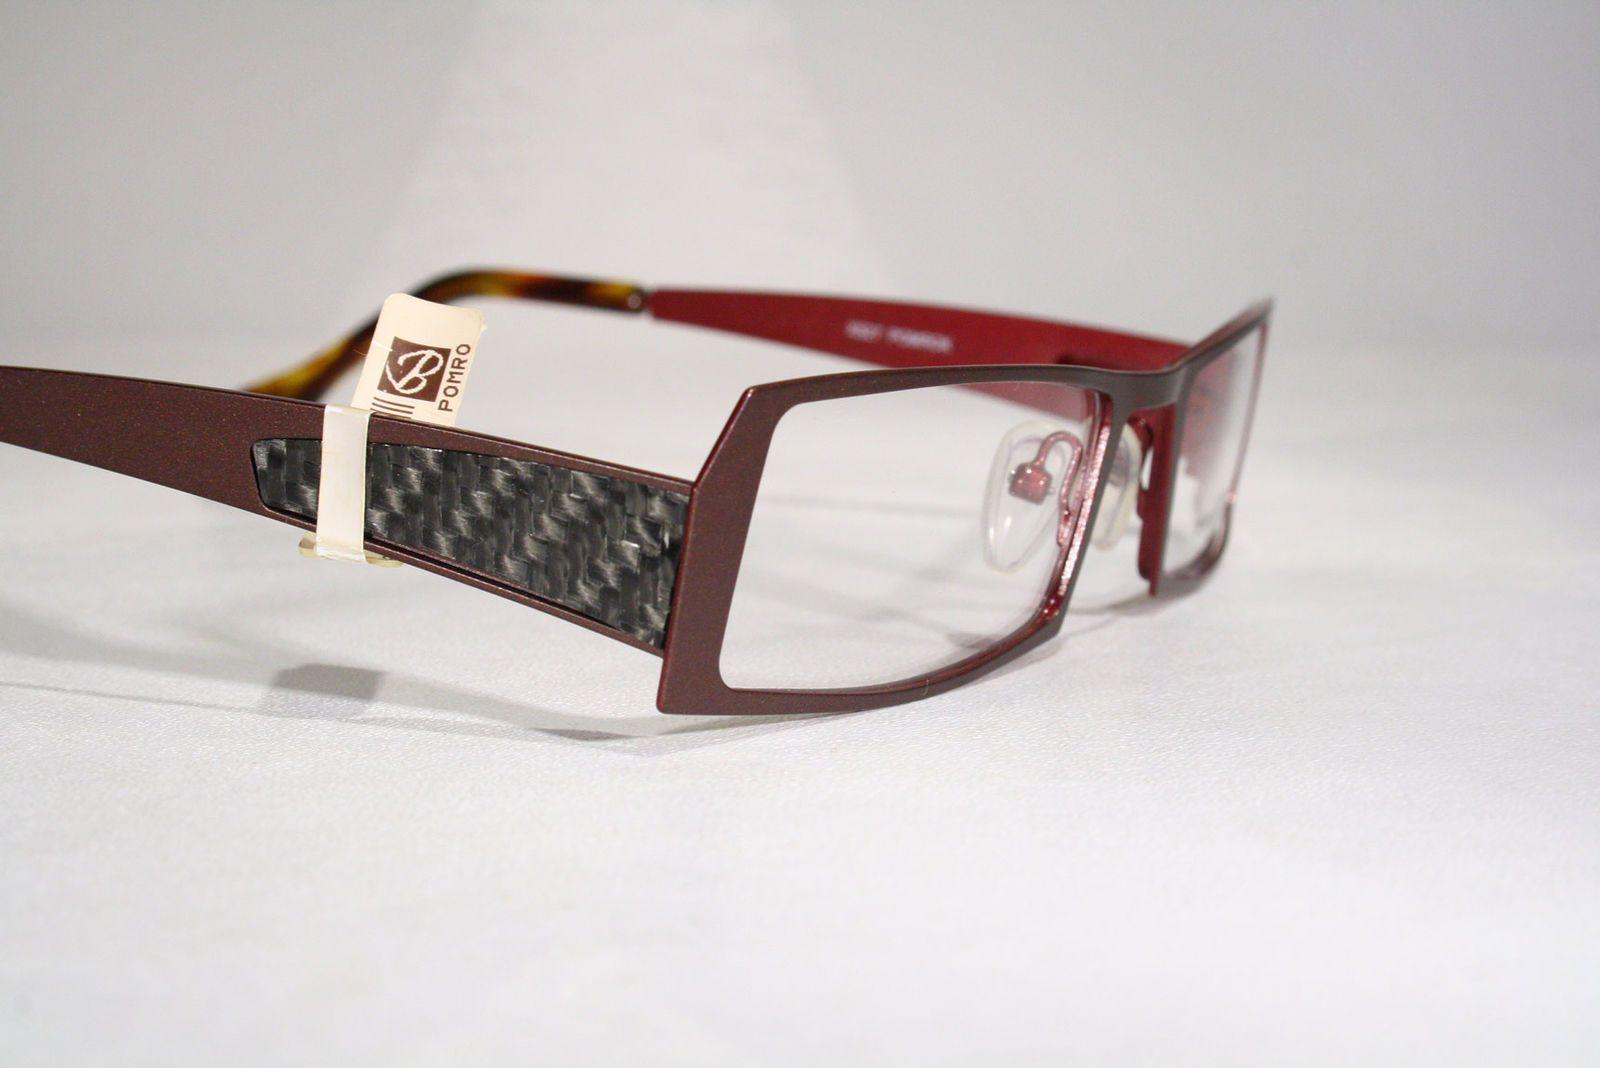 e7019371eab New TRACTION PRODUCTIONS  POMROK  Brown Eyeglass Frames Eyeglasses with  Carbon Fiber Details   eBay (RipVanW)